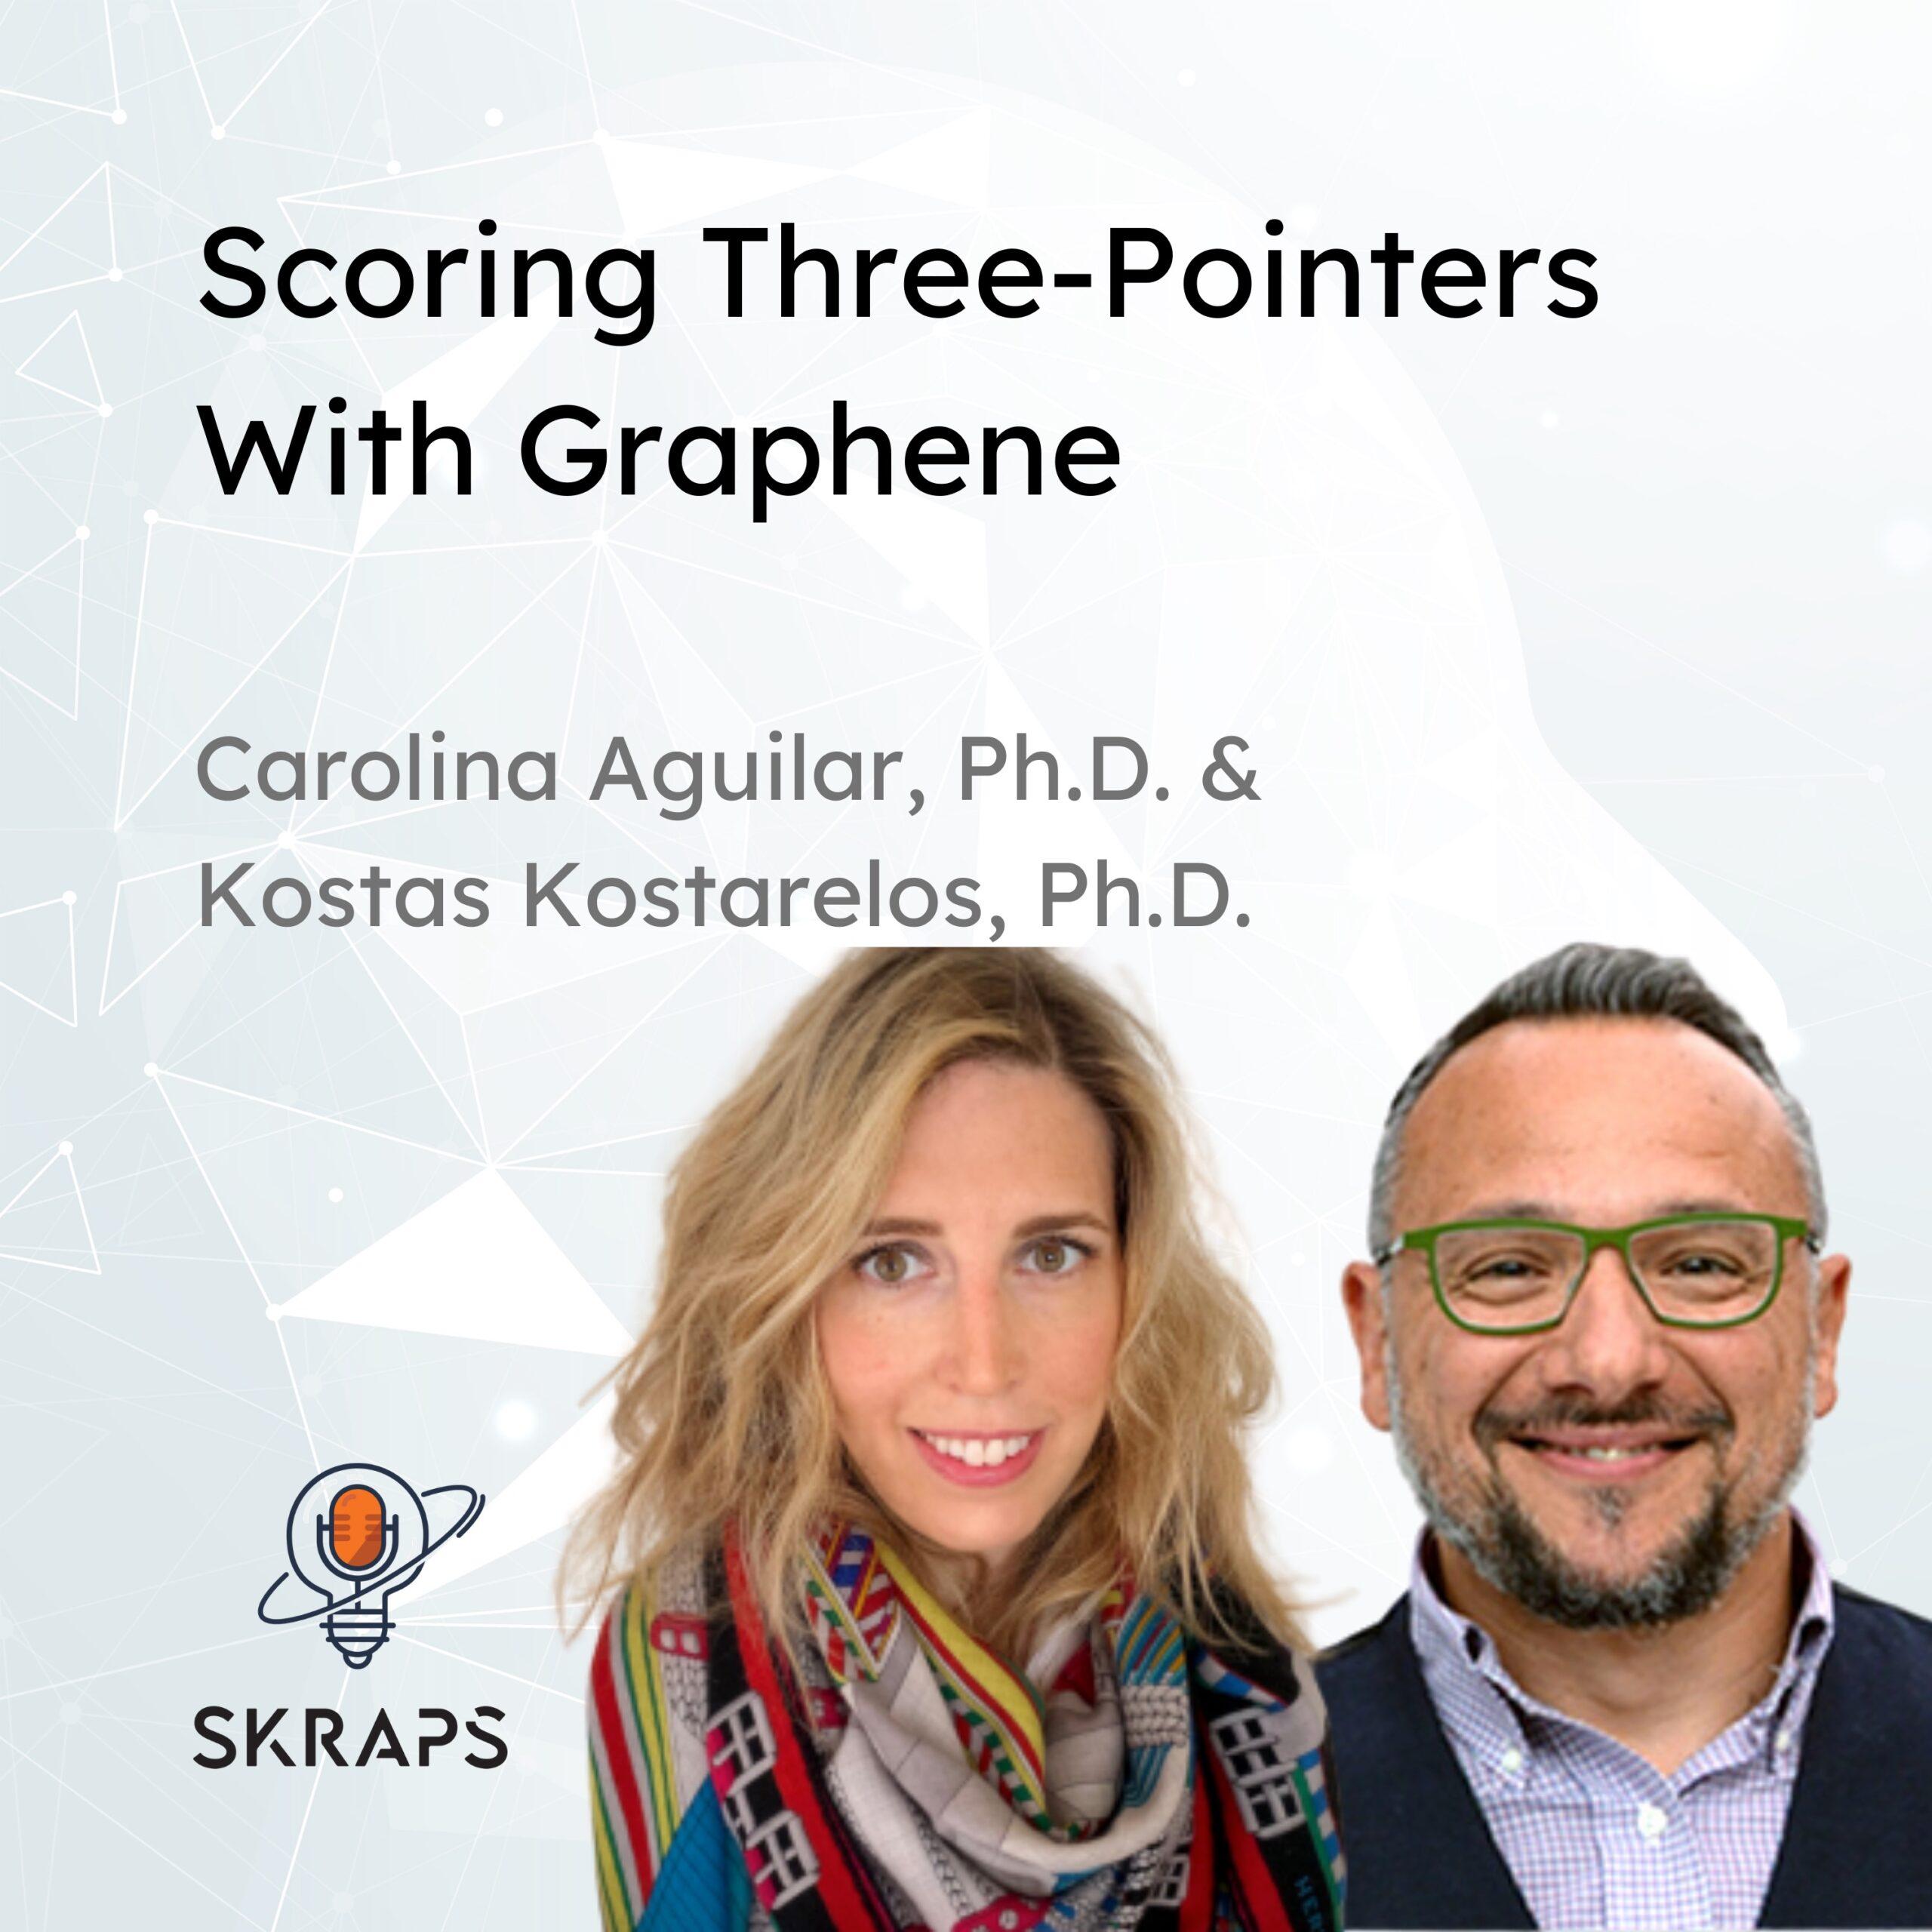 Scoring three-pointers with Graphene